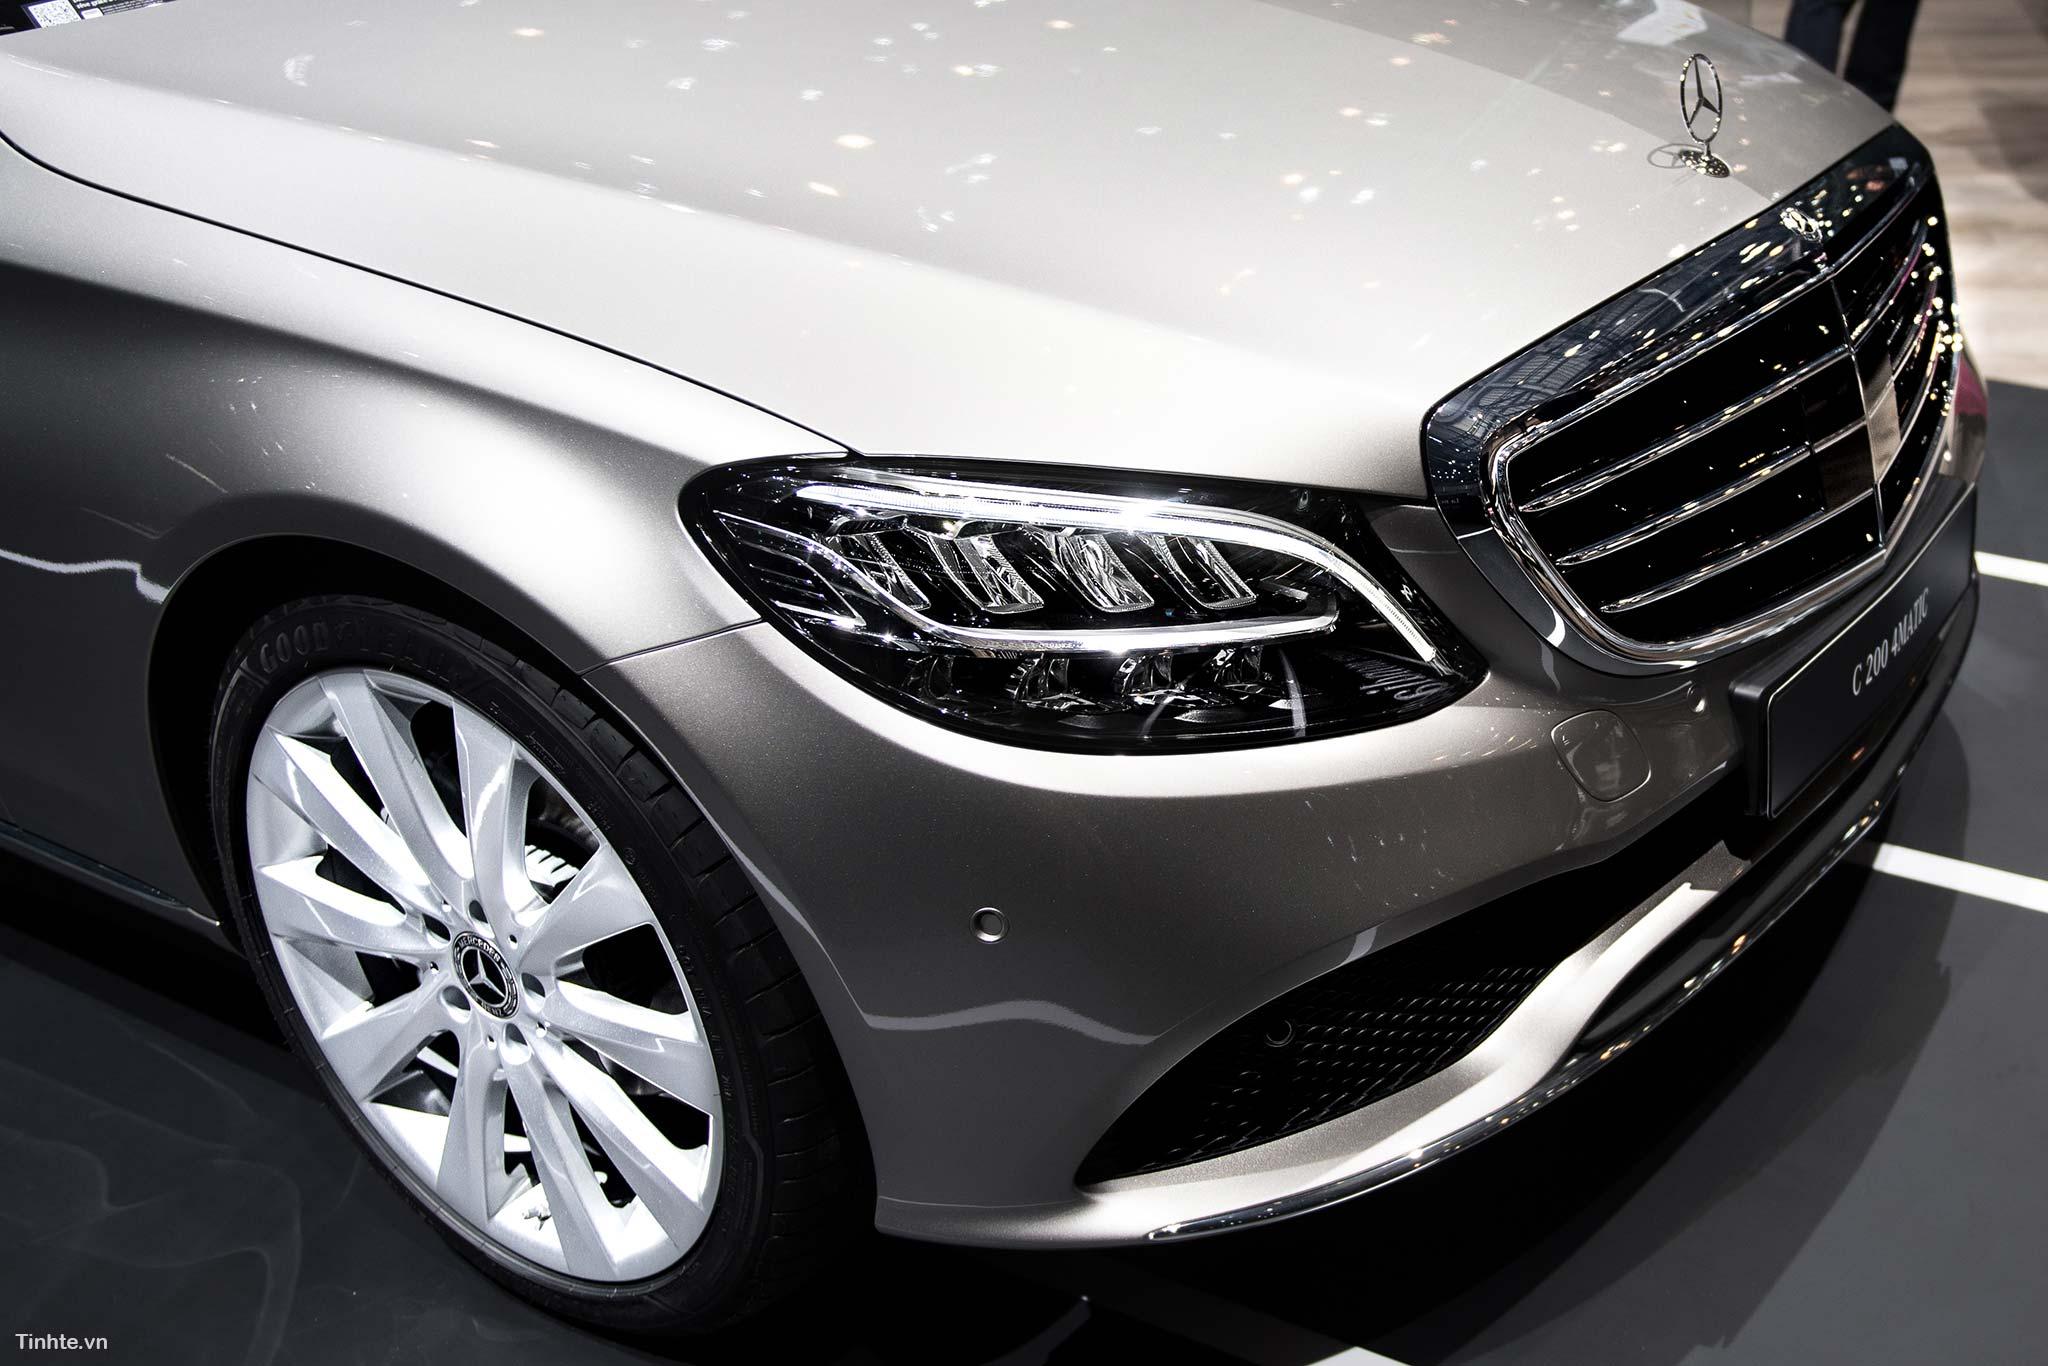 tinhte_Mercedes-Benz-C-200-4MATIC-7.jpg